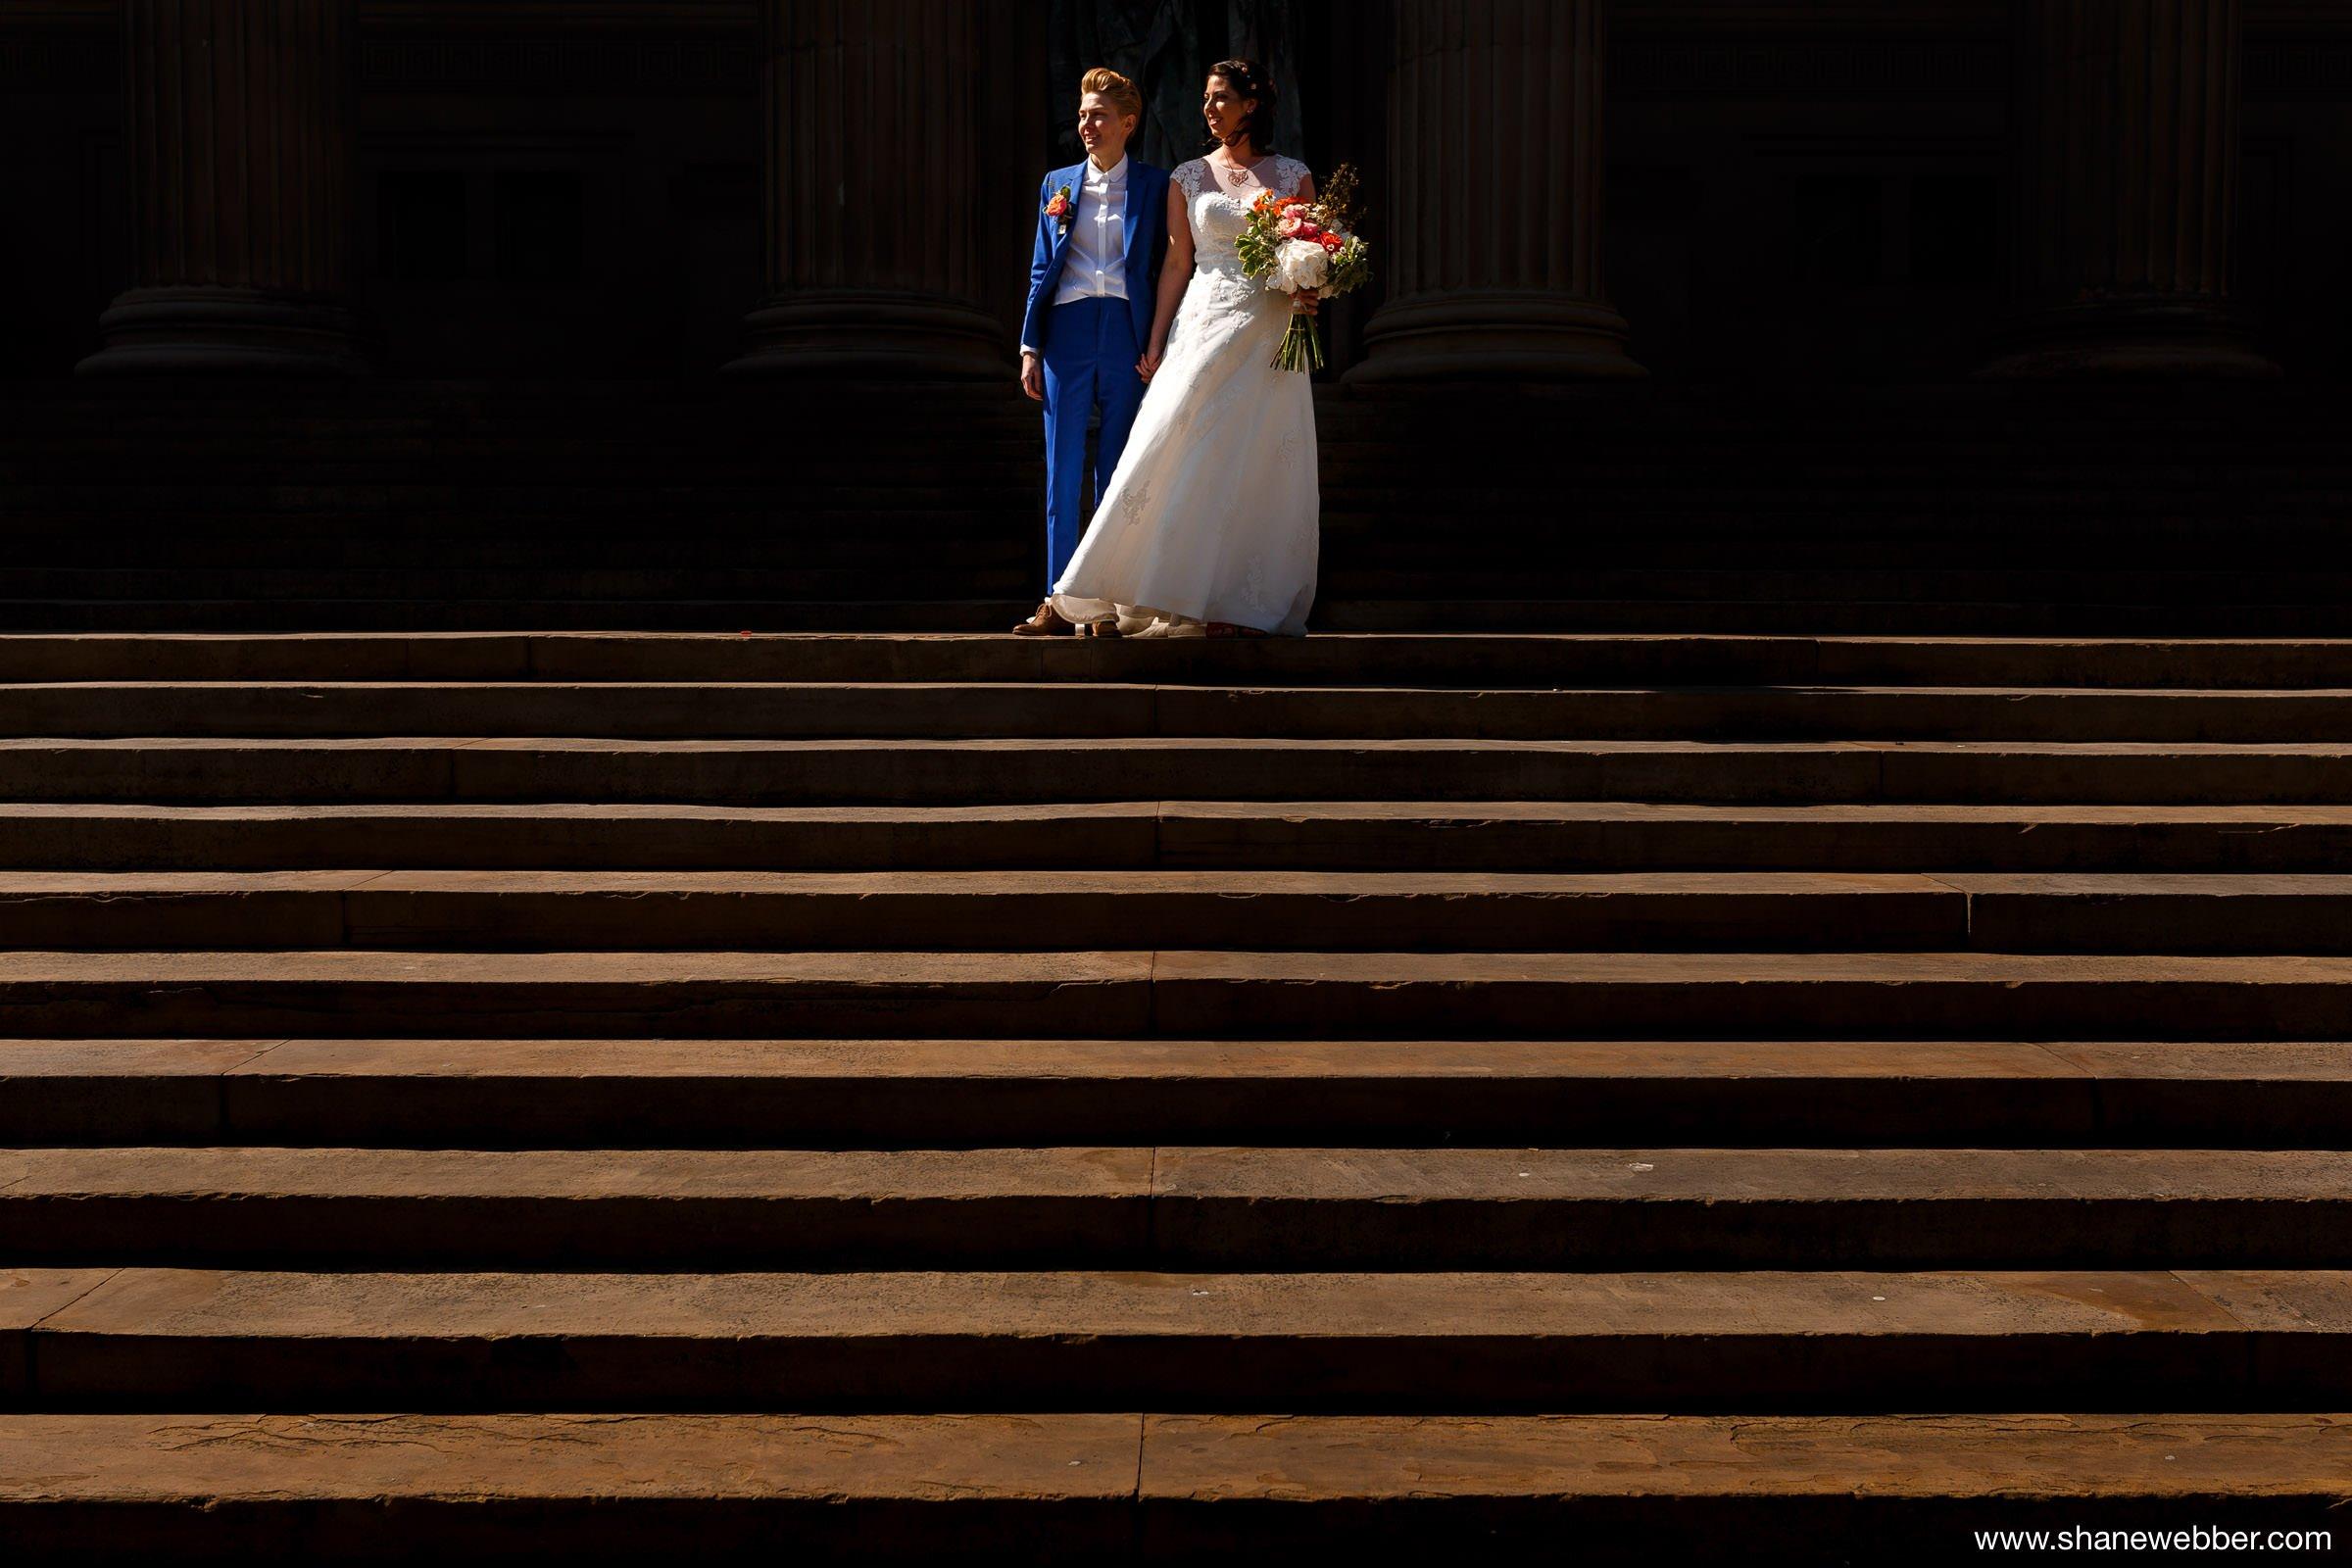 Best Liverpool Wedding Photographer 2016